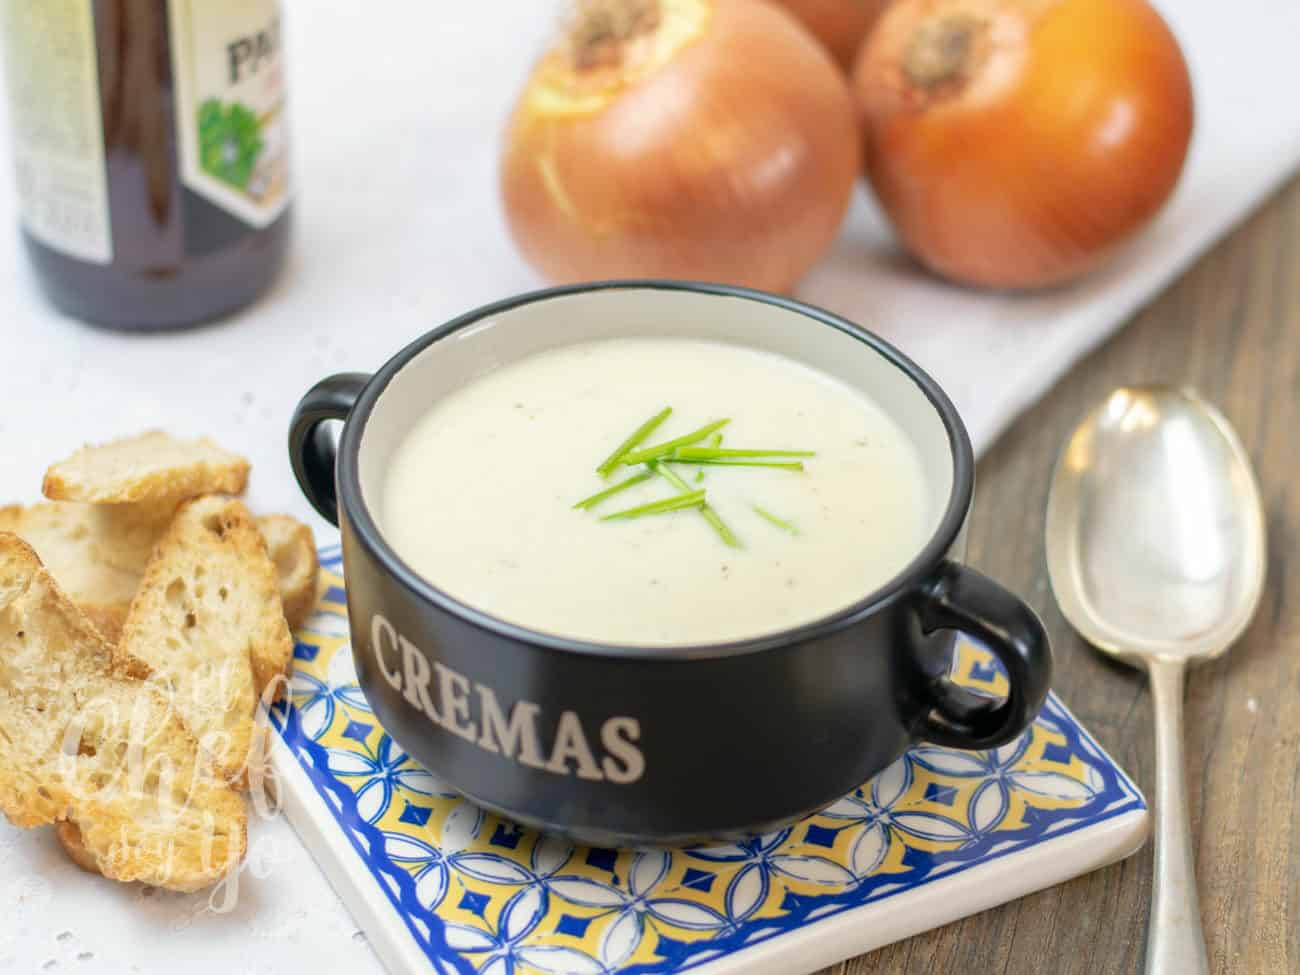 Crema de cebolla a la cerveza (Thermomix)